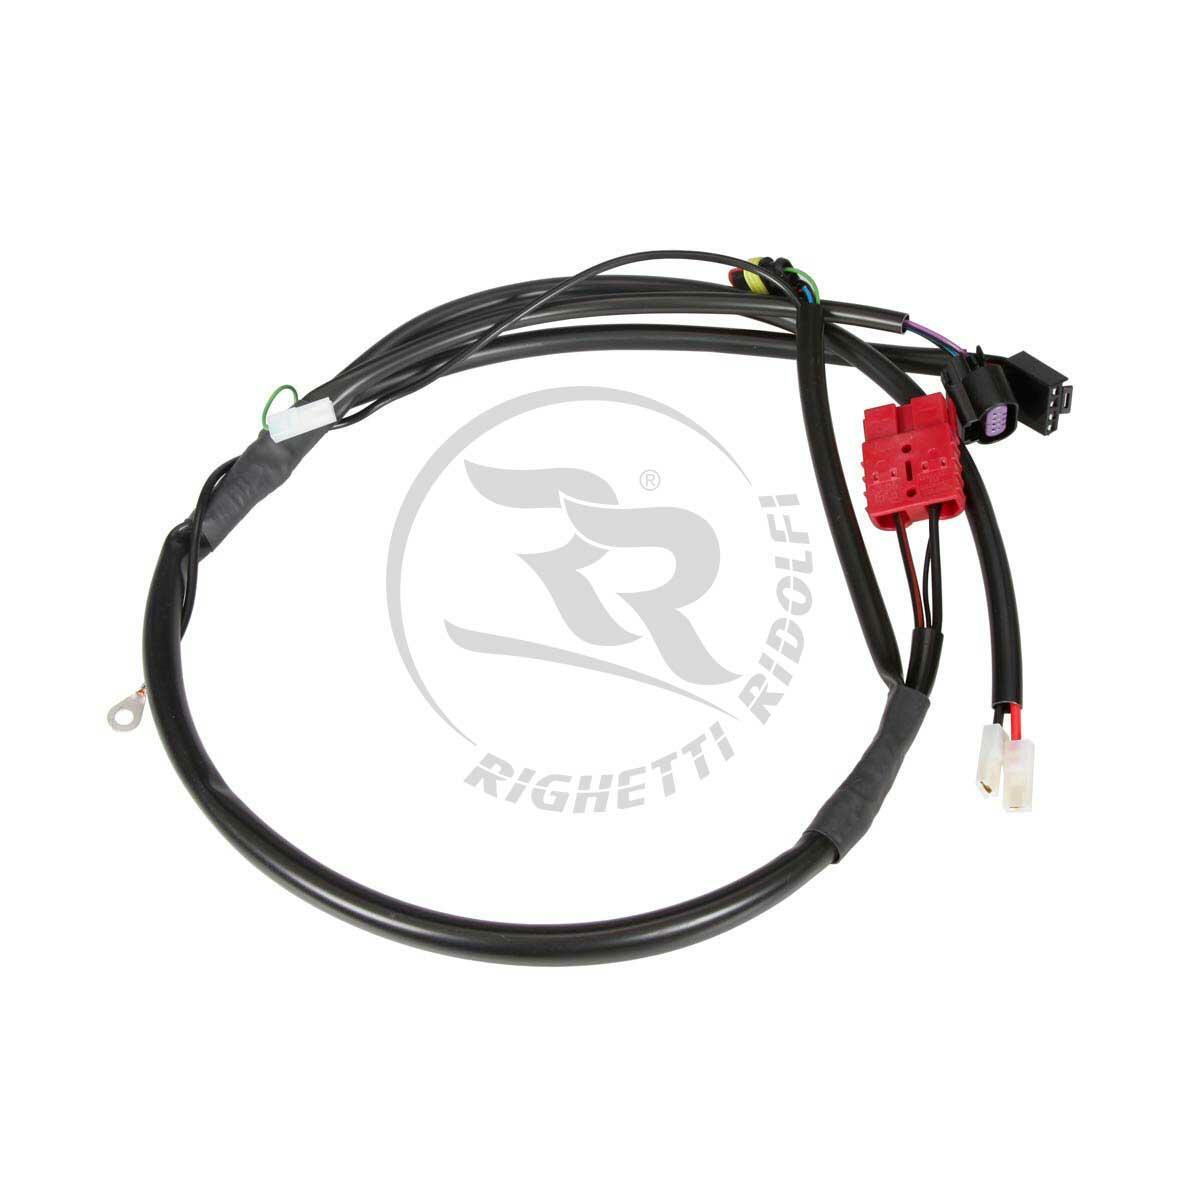 hight resolution of wiring harness pvl ignition cod 683 501 type kf kfj